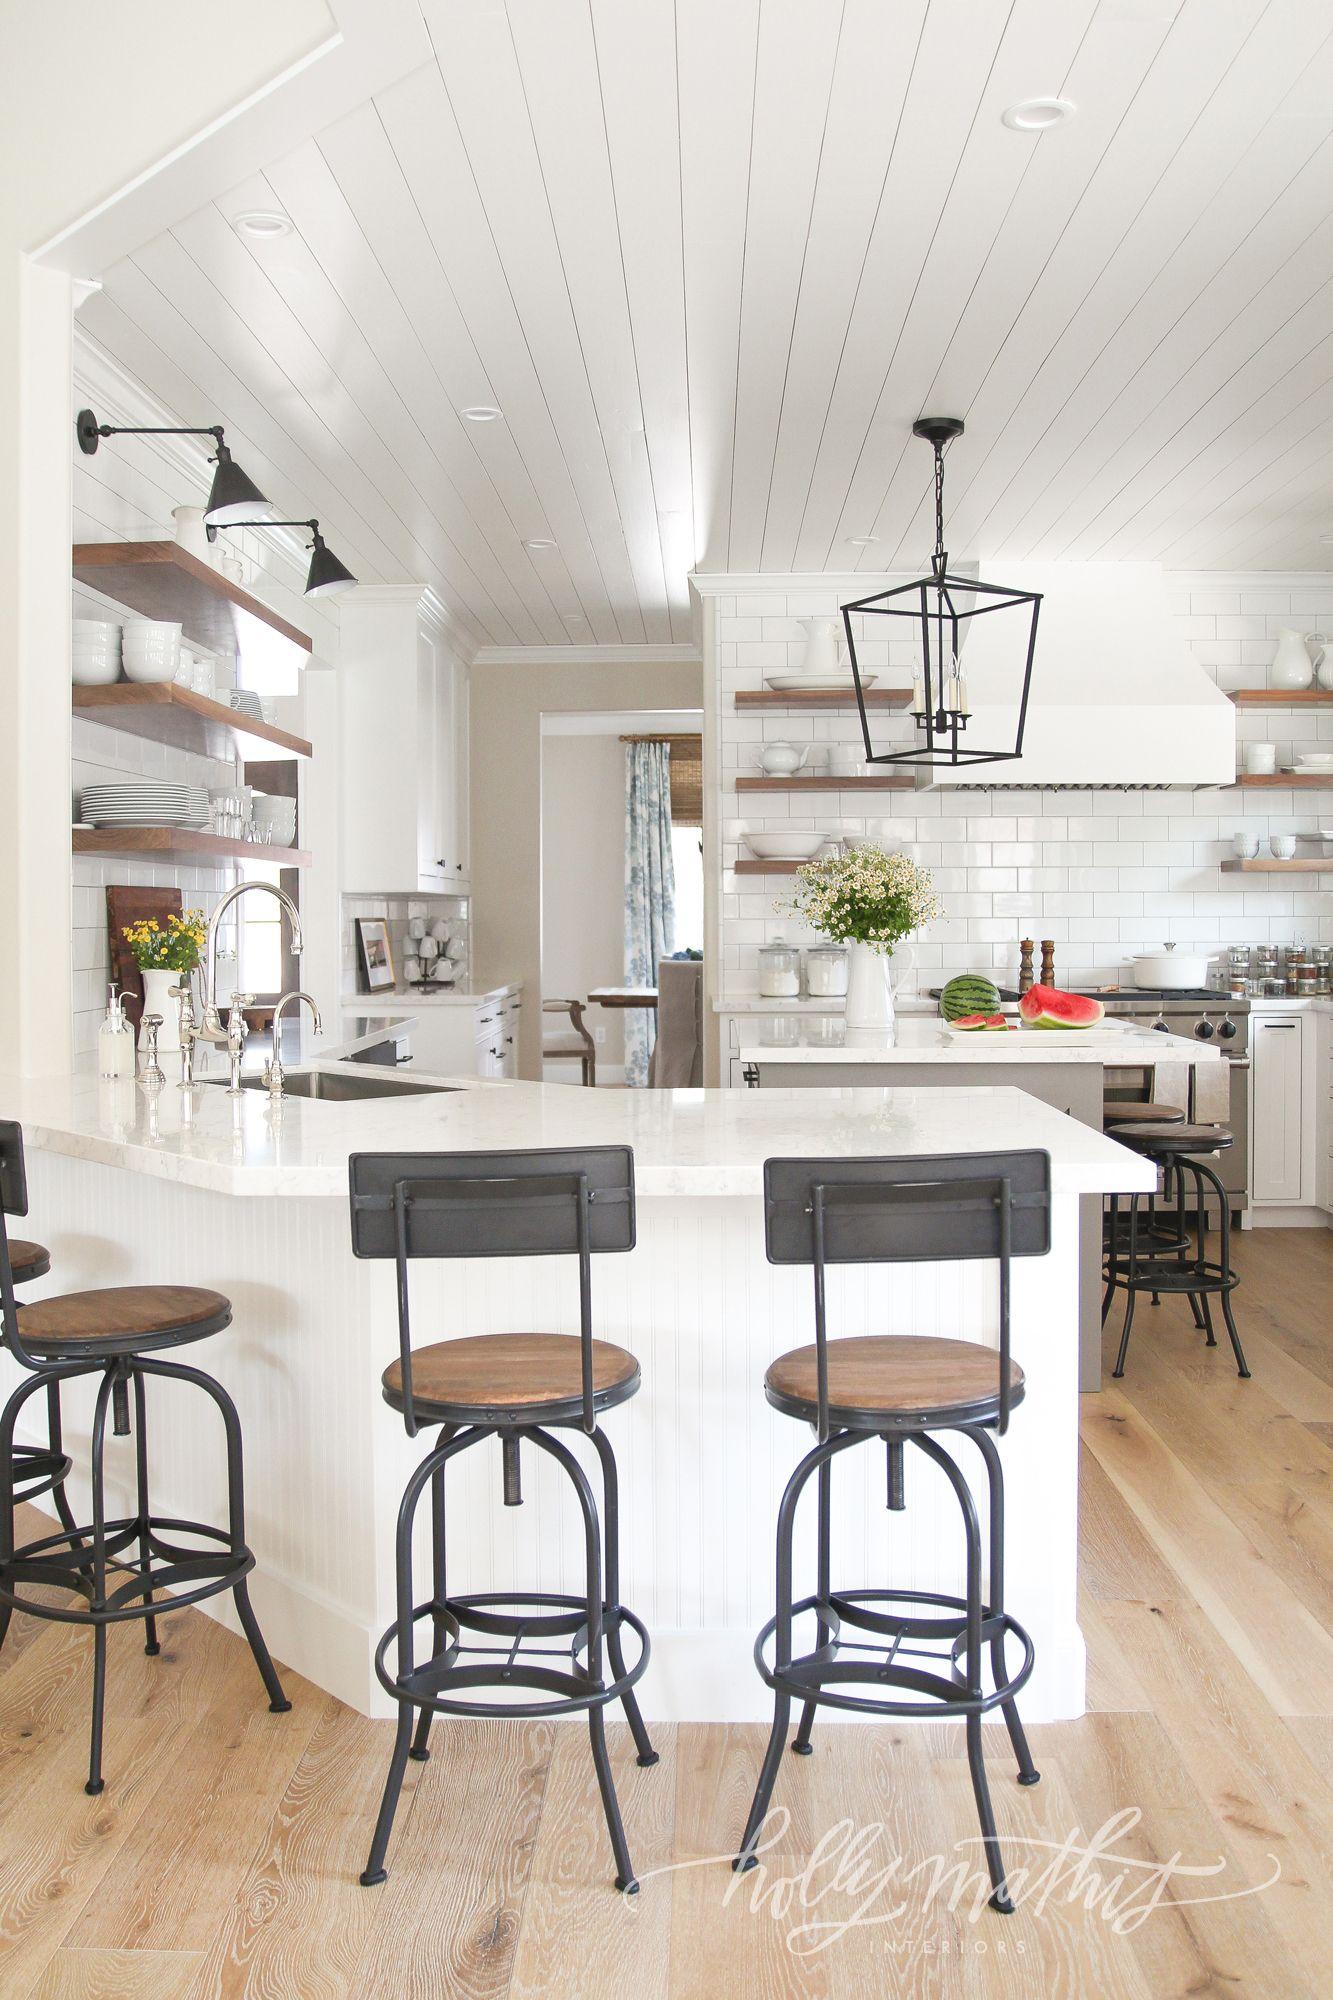 suburban charm modern farmhouse kitchens farmhouse on best farmhouse kitchen decor ideas and remodel create your dreams id=64917